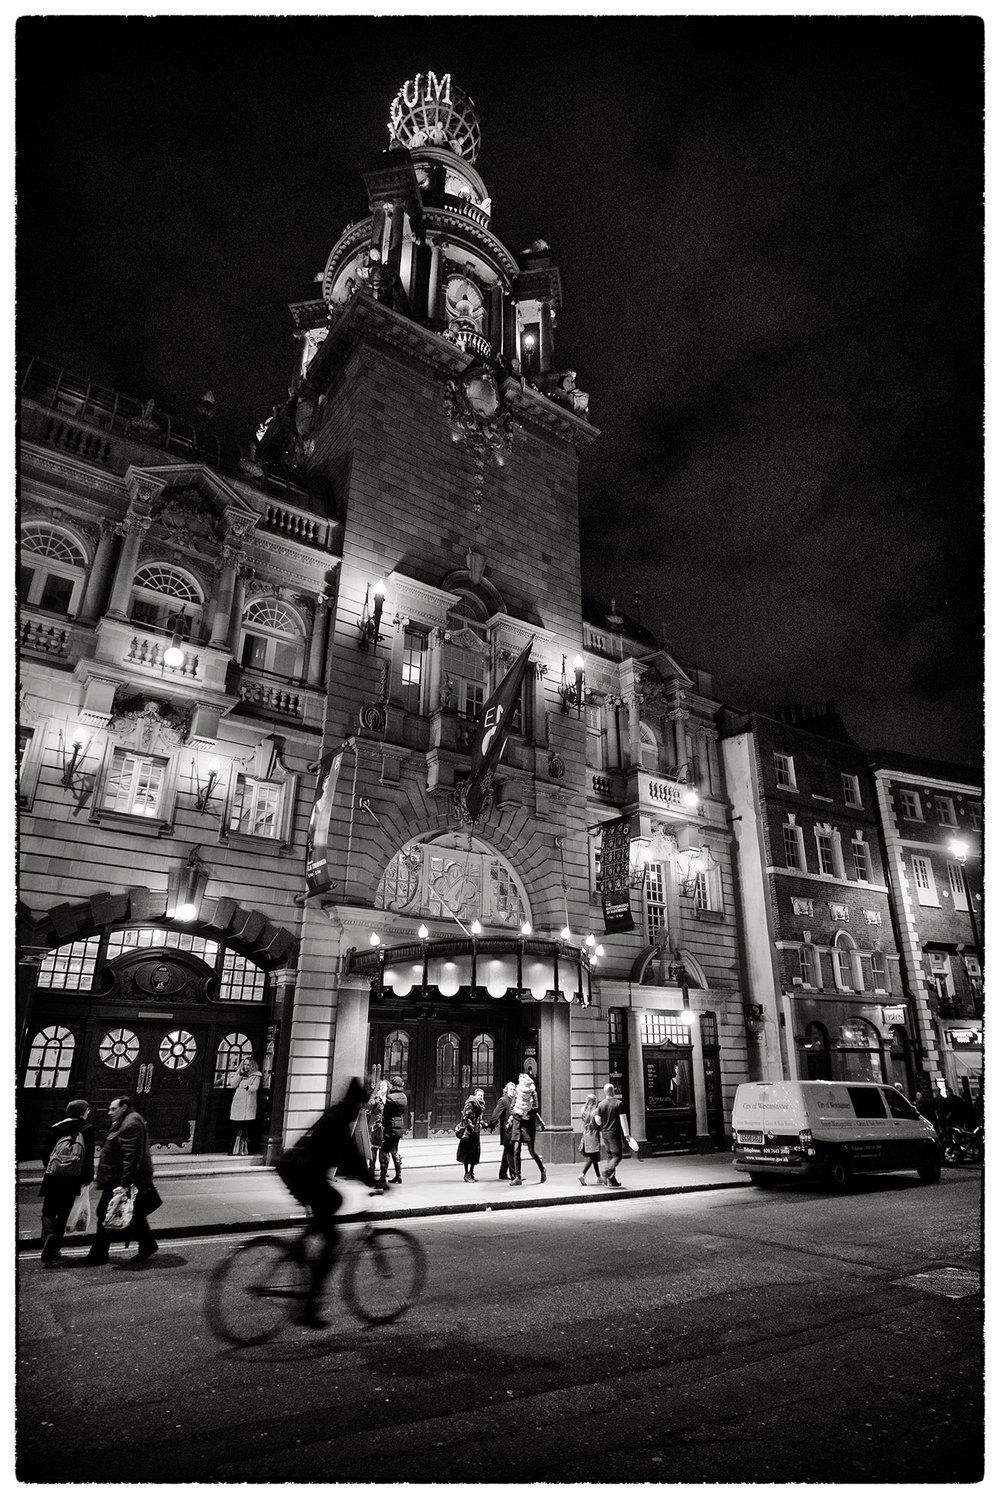 The Coliseum Theatre, just off Trafalgar Square, London.